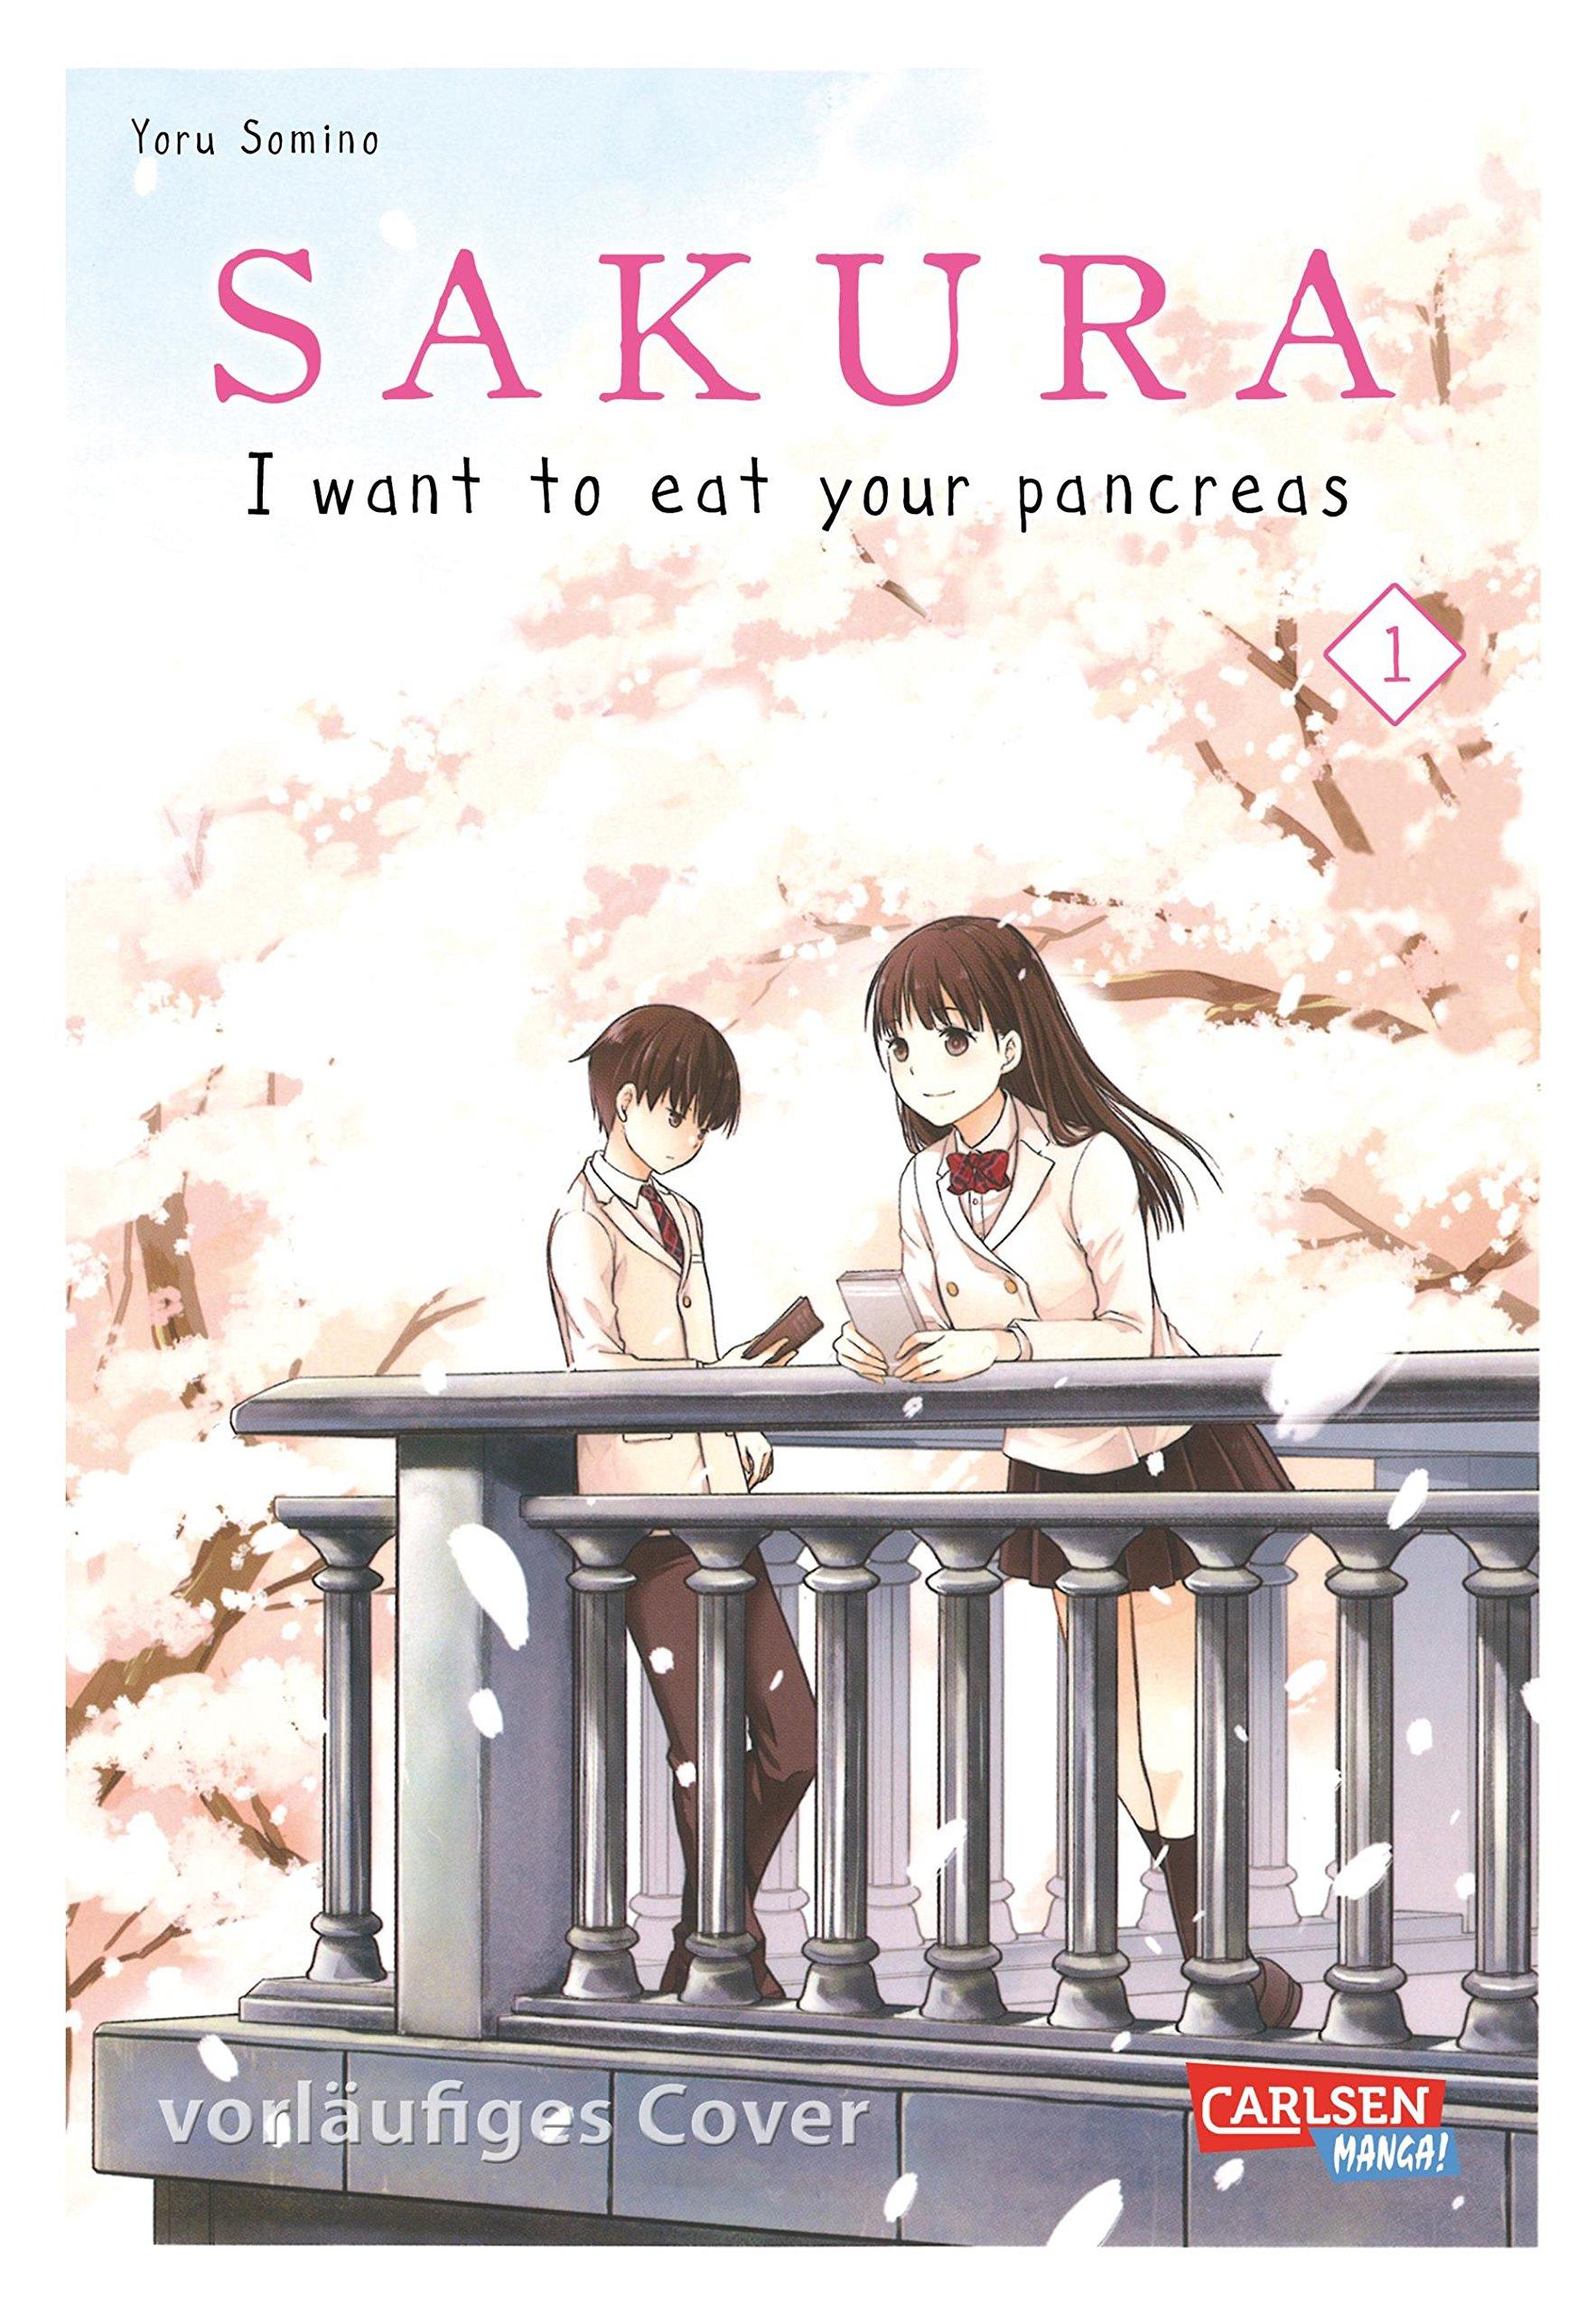 Sakura - I want to eat your pancreas 1 Taschenbuch – 27. November 2018 Yoru Sumino Carlsen 3551735794 Comic / Graphic Novel